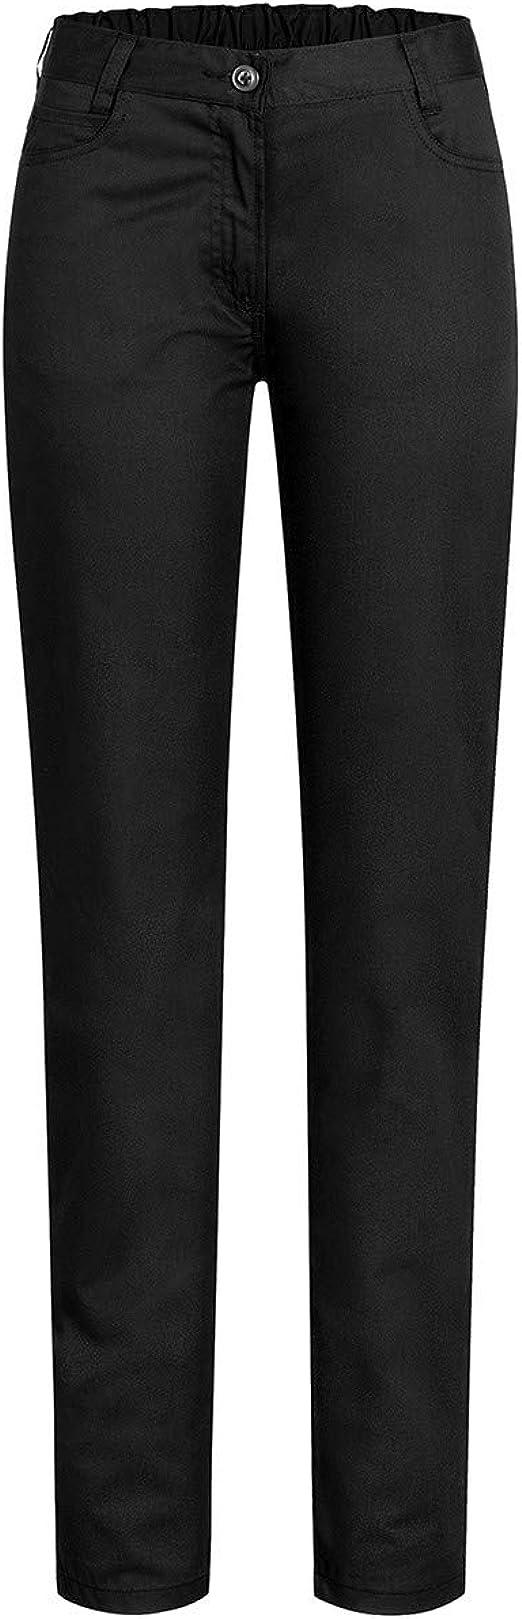 Style 5319 GREIFF Damenhose Cuisine Basic Schwarz Five Pocket  Regular Fit